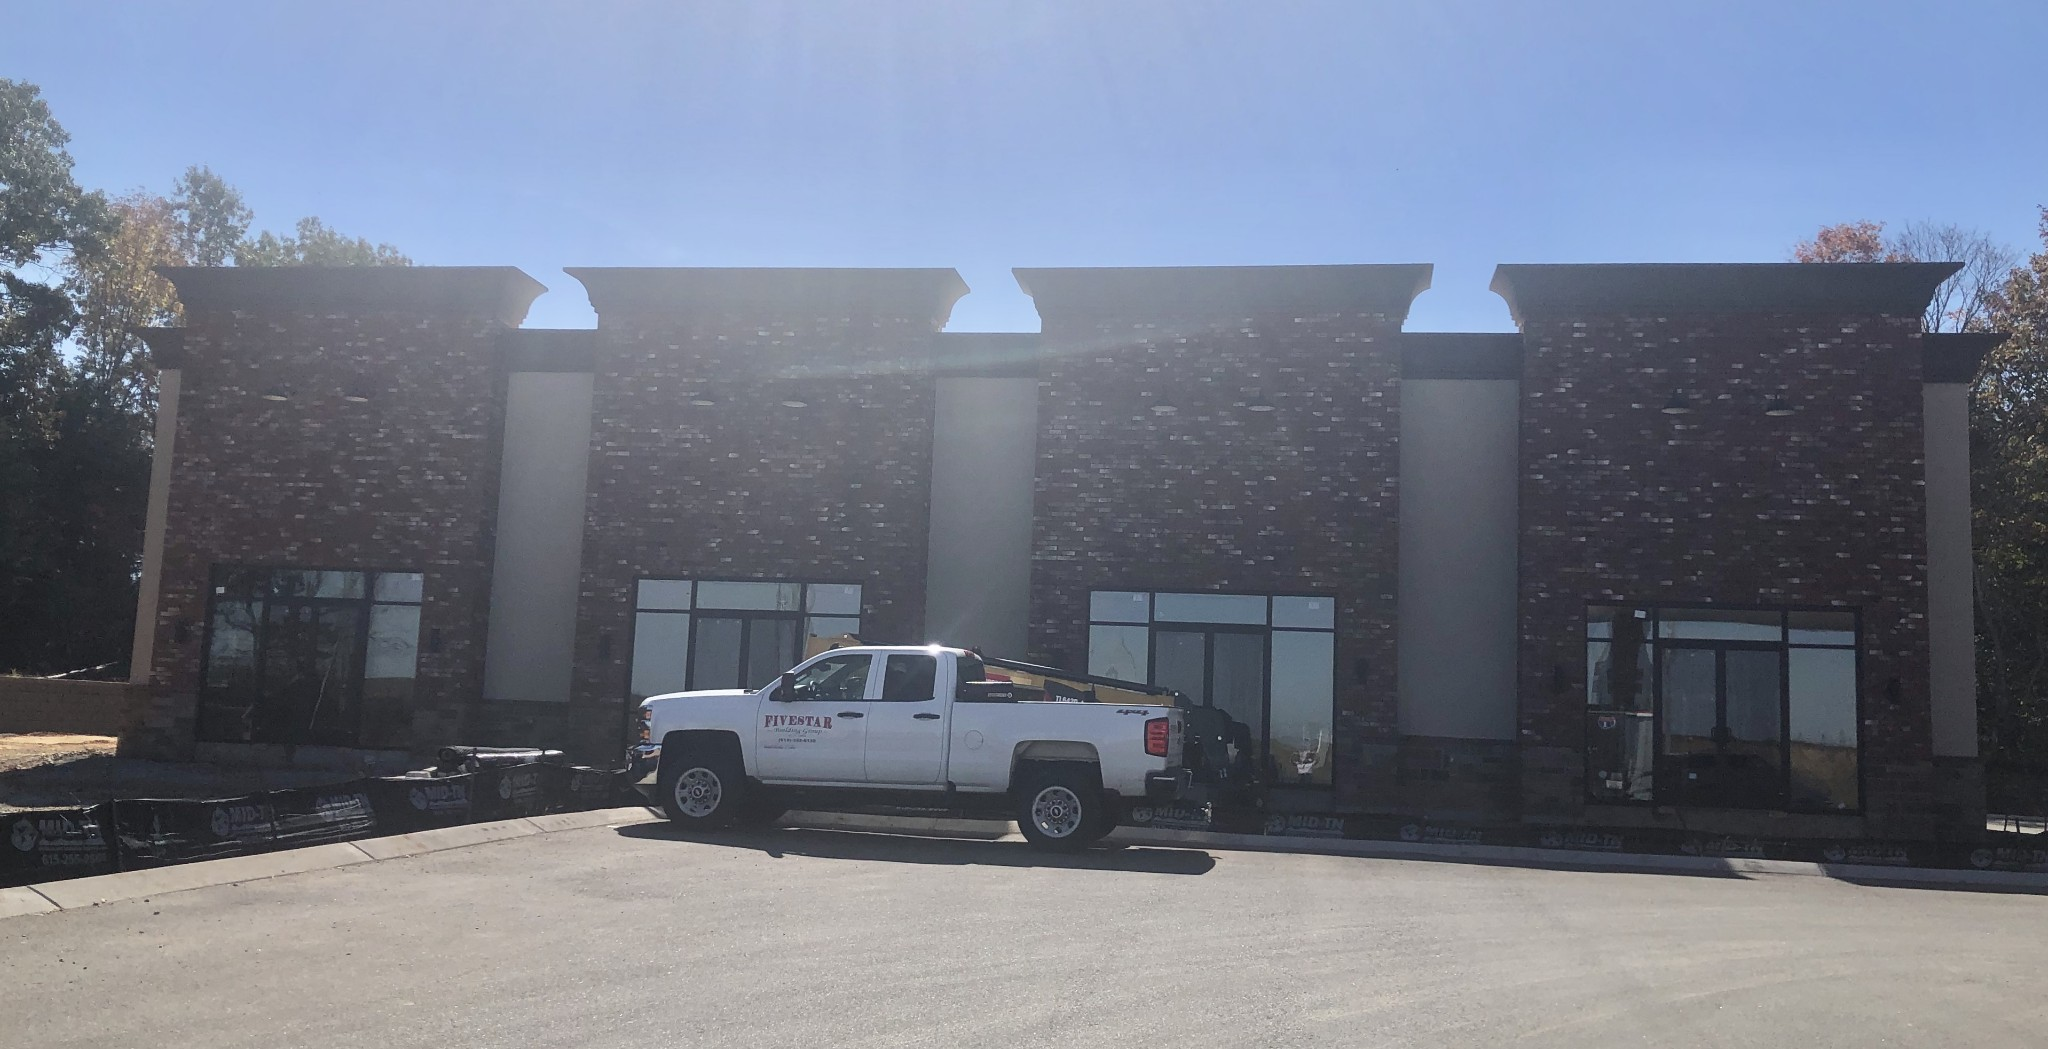 1560 Hankook Rd, Suite A, Clarksville TN 37043 - Photo 1